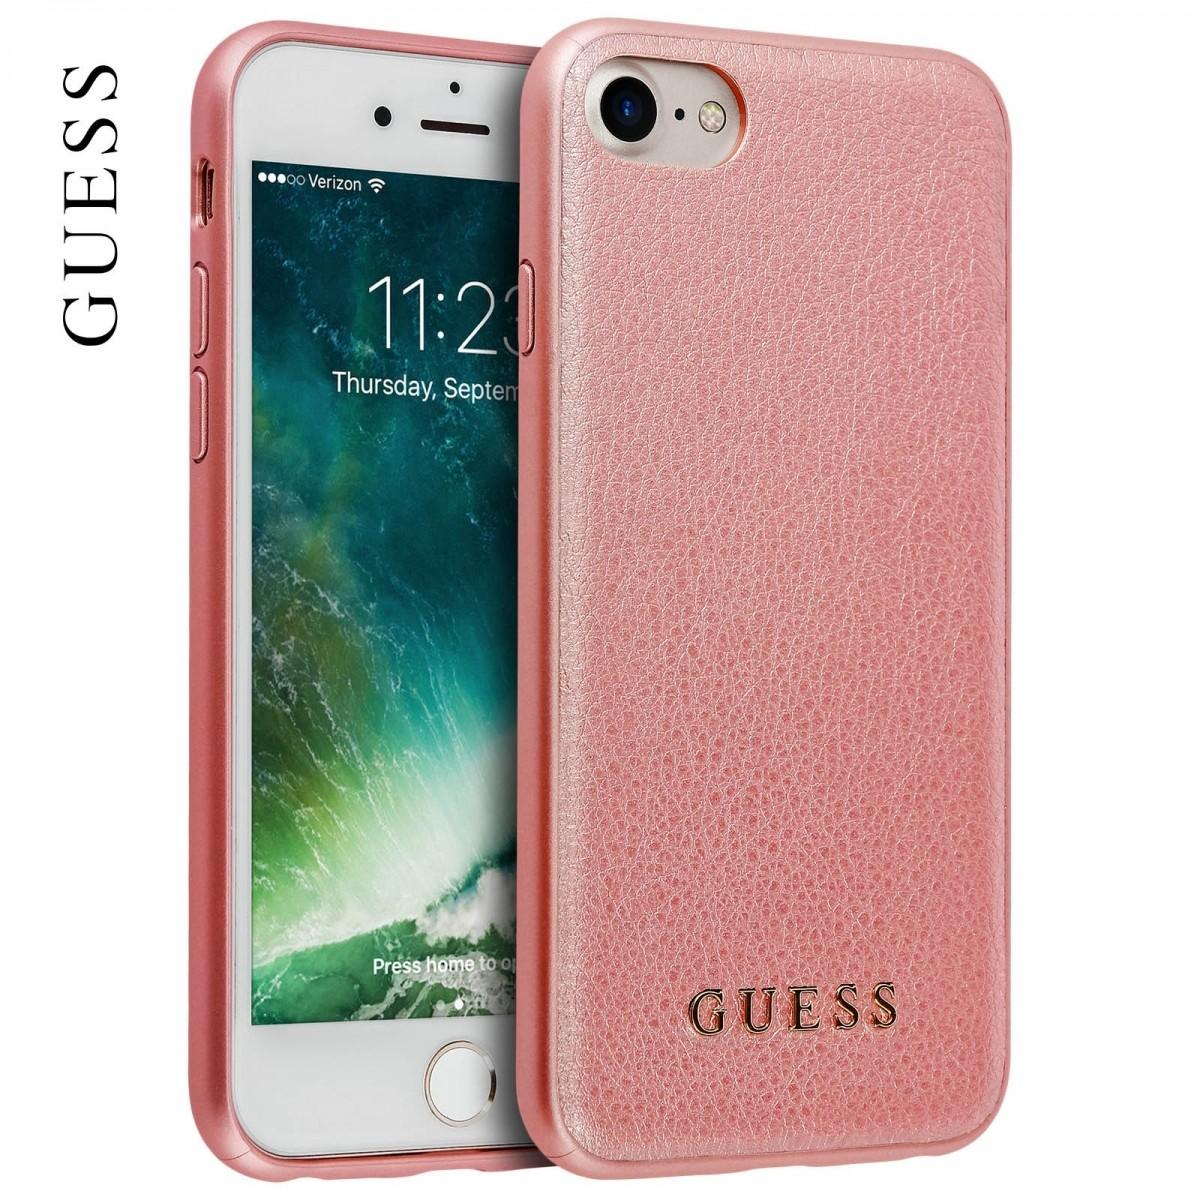 Zadní kryt Guess IriDescent TPU GUHCP7IGLRG pro iPhone 7 8 - růžovo-zlatý cb4327de495